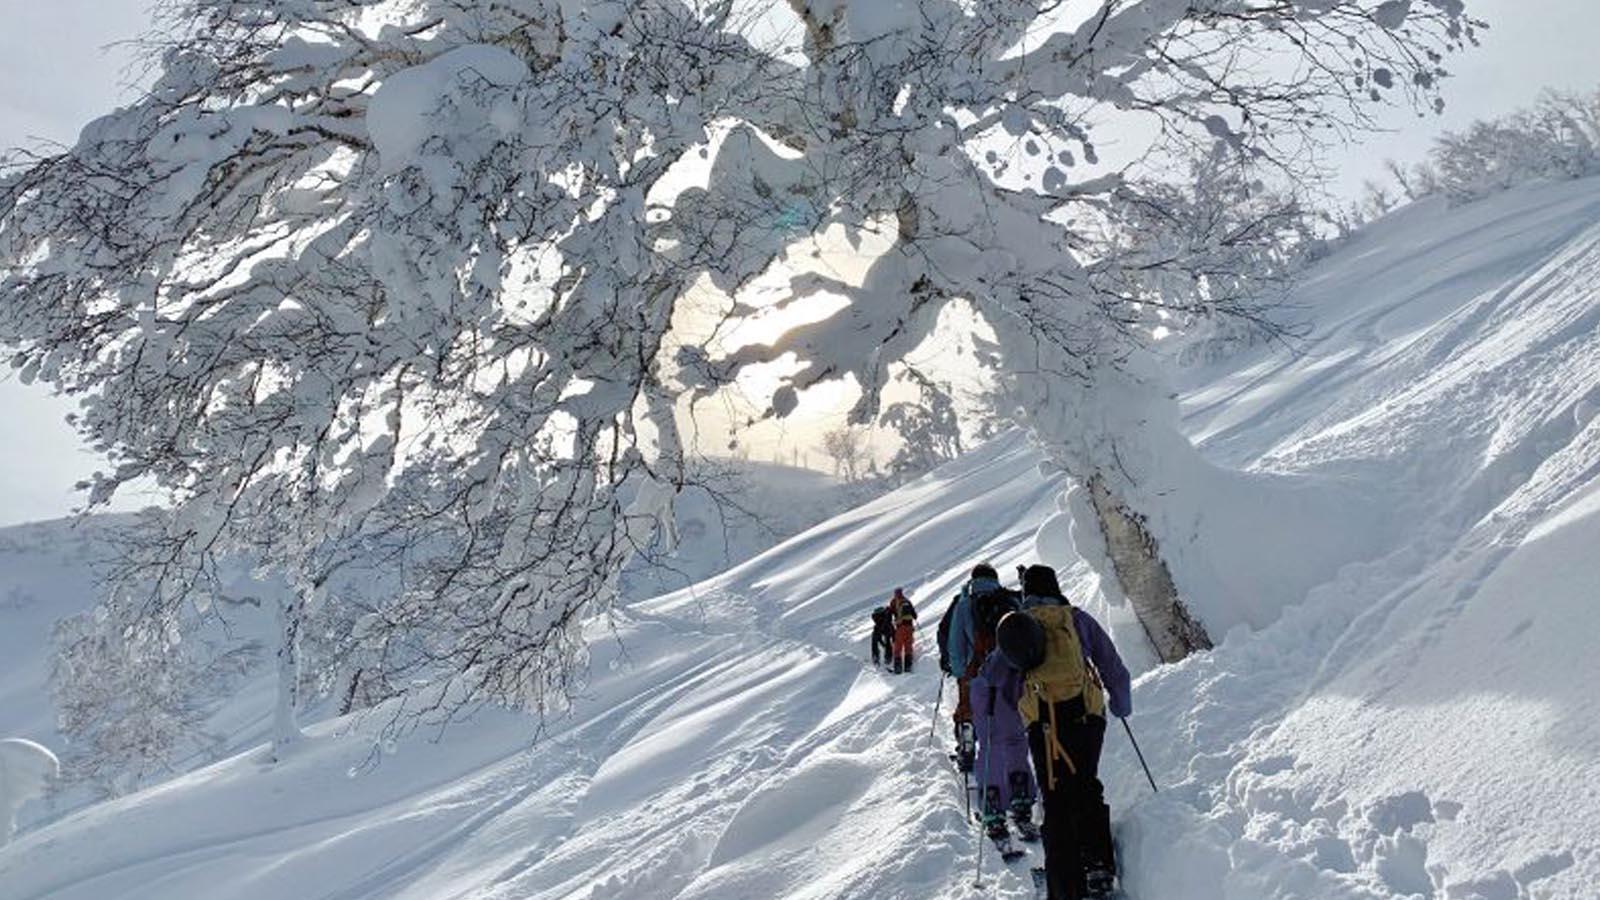 Evoc 21/22 Snow Safety Preview